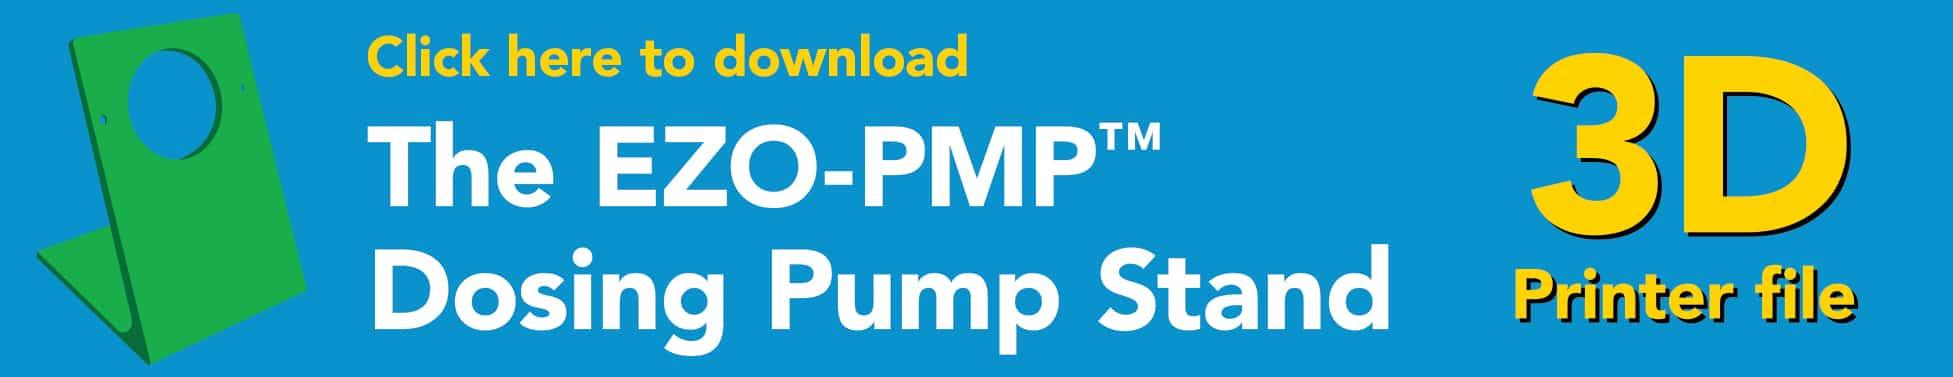 EZO-PMP™ Dosing Pump Stand